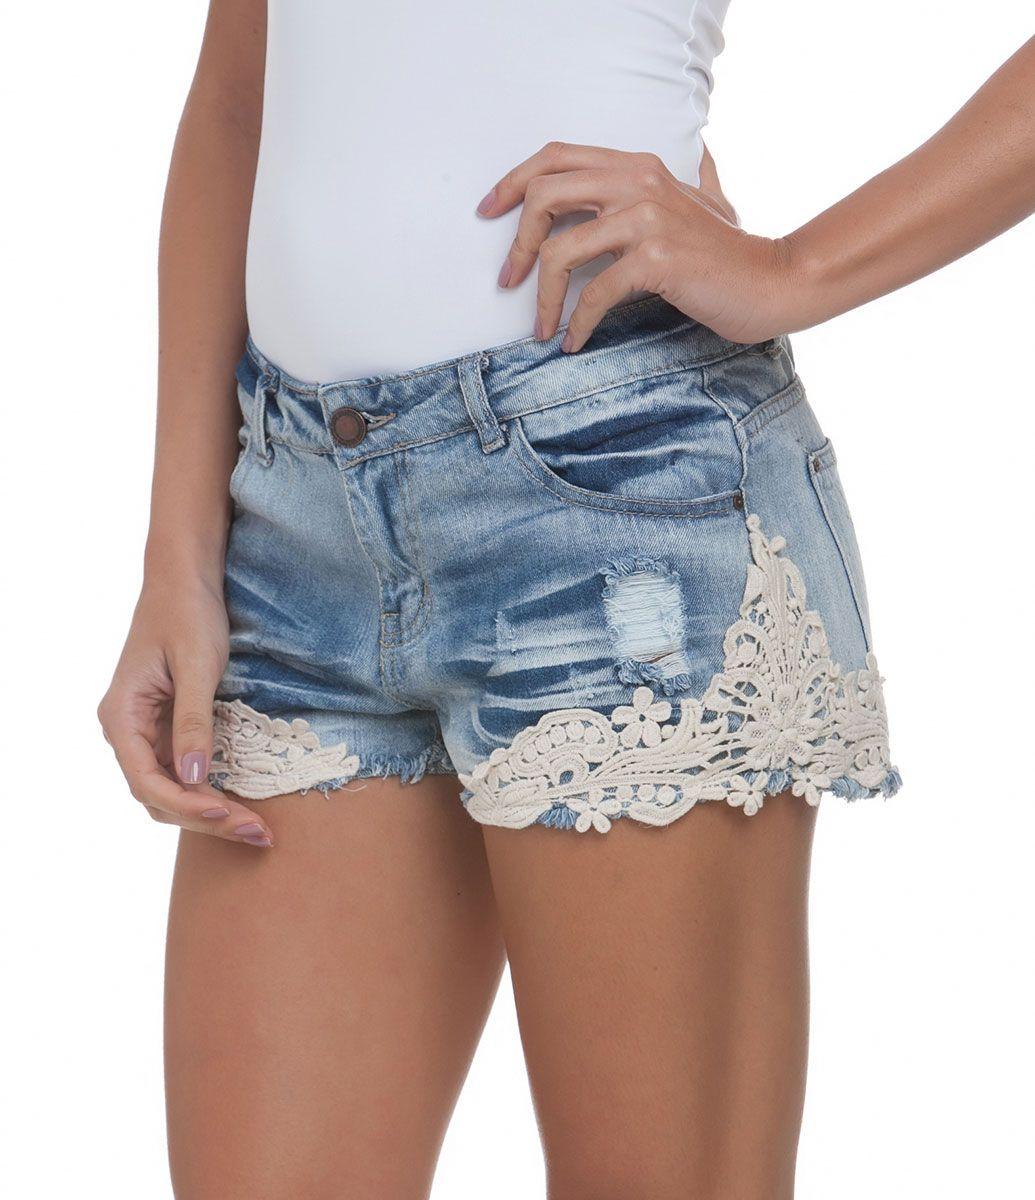 Short Feminino em Jeans com Renda Guipir - Lojas Renner | roupas | Pinterest | Jeans Ems and Shorts